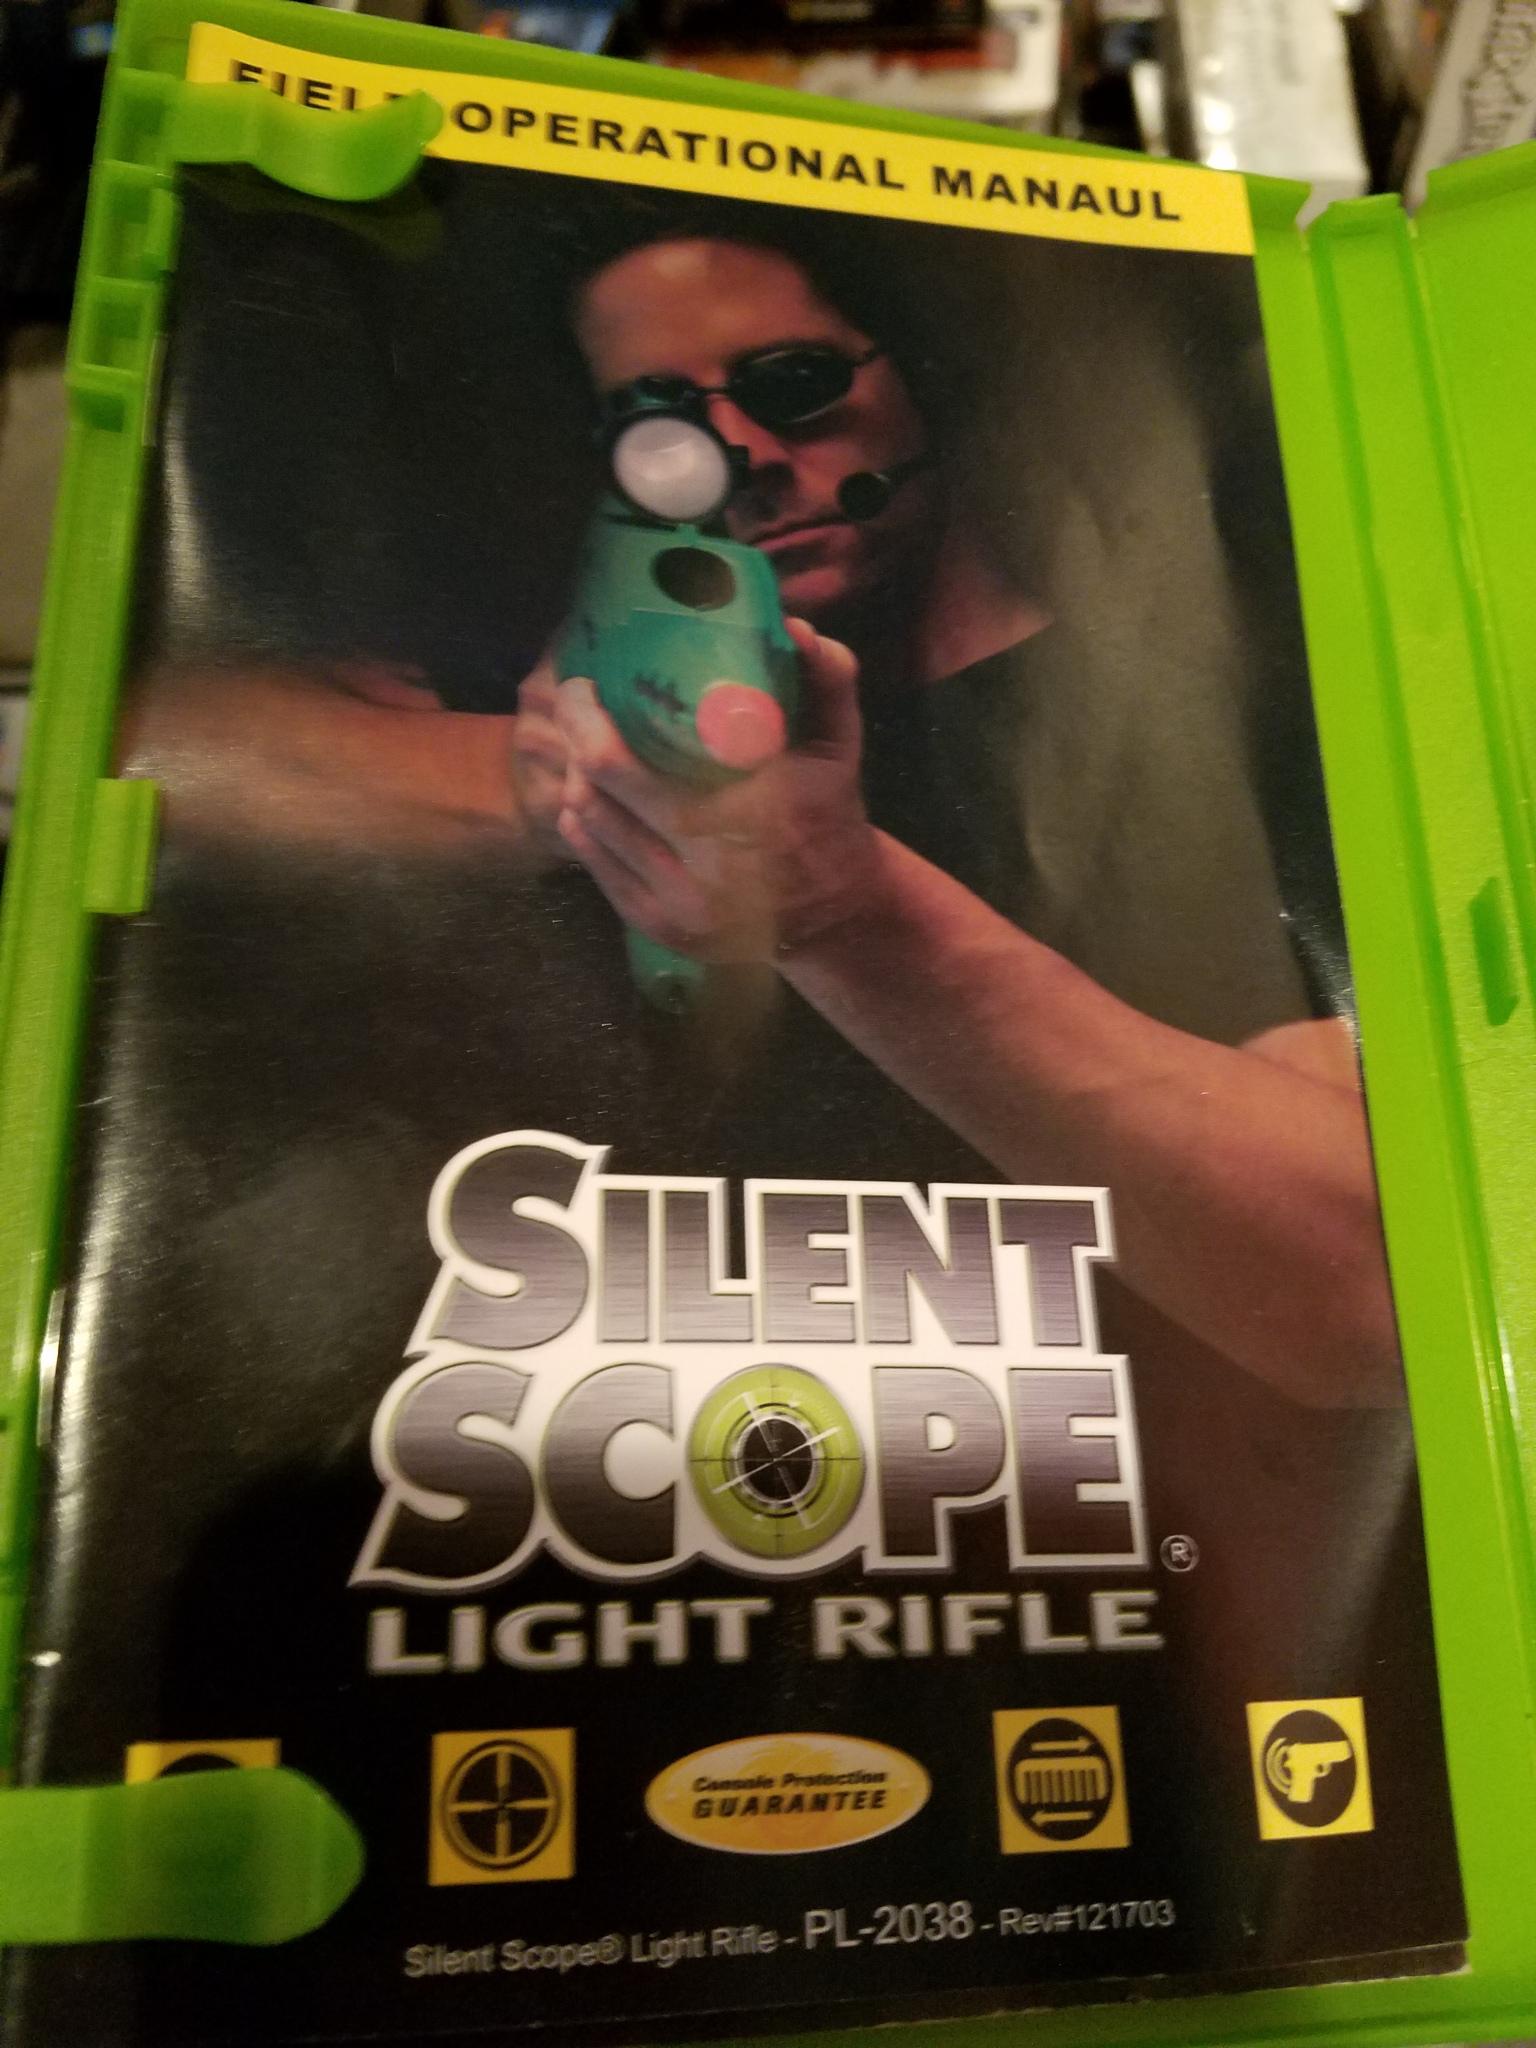 silentscope